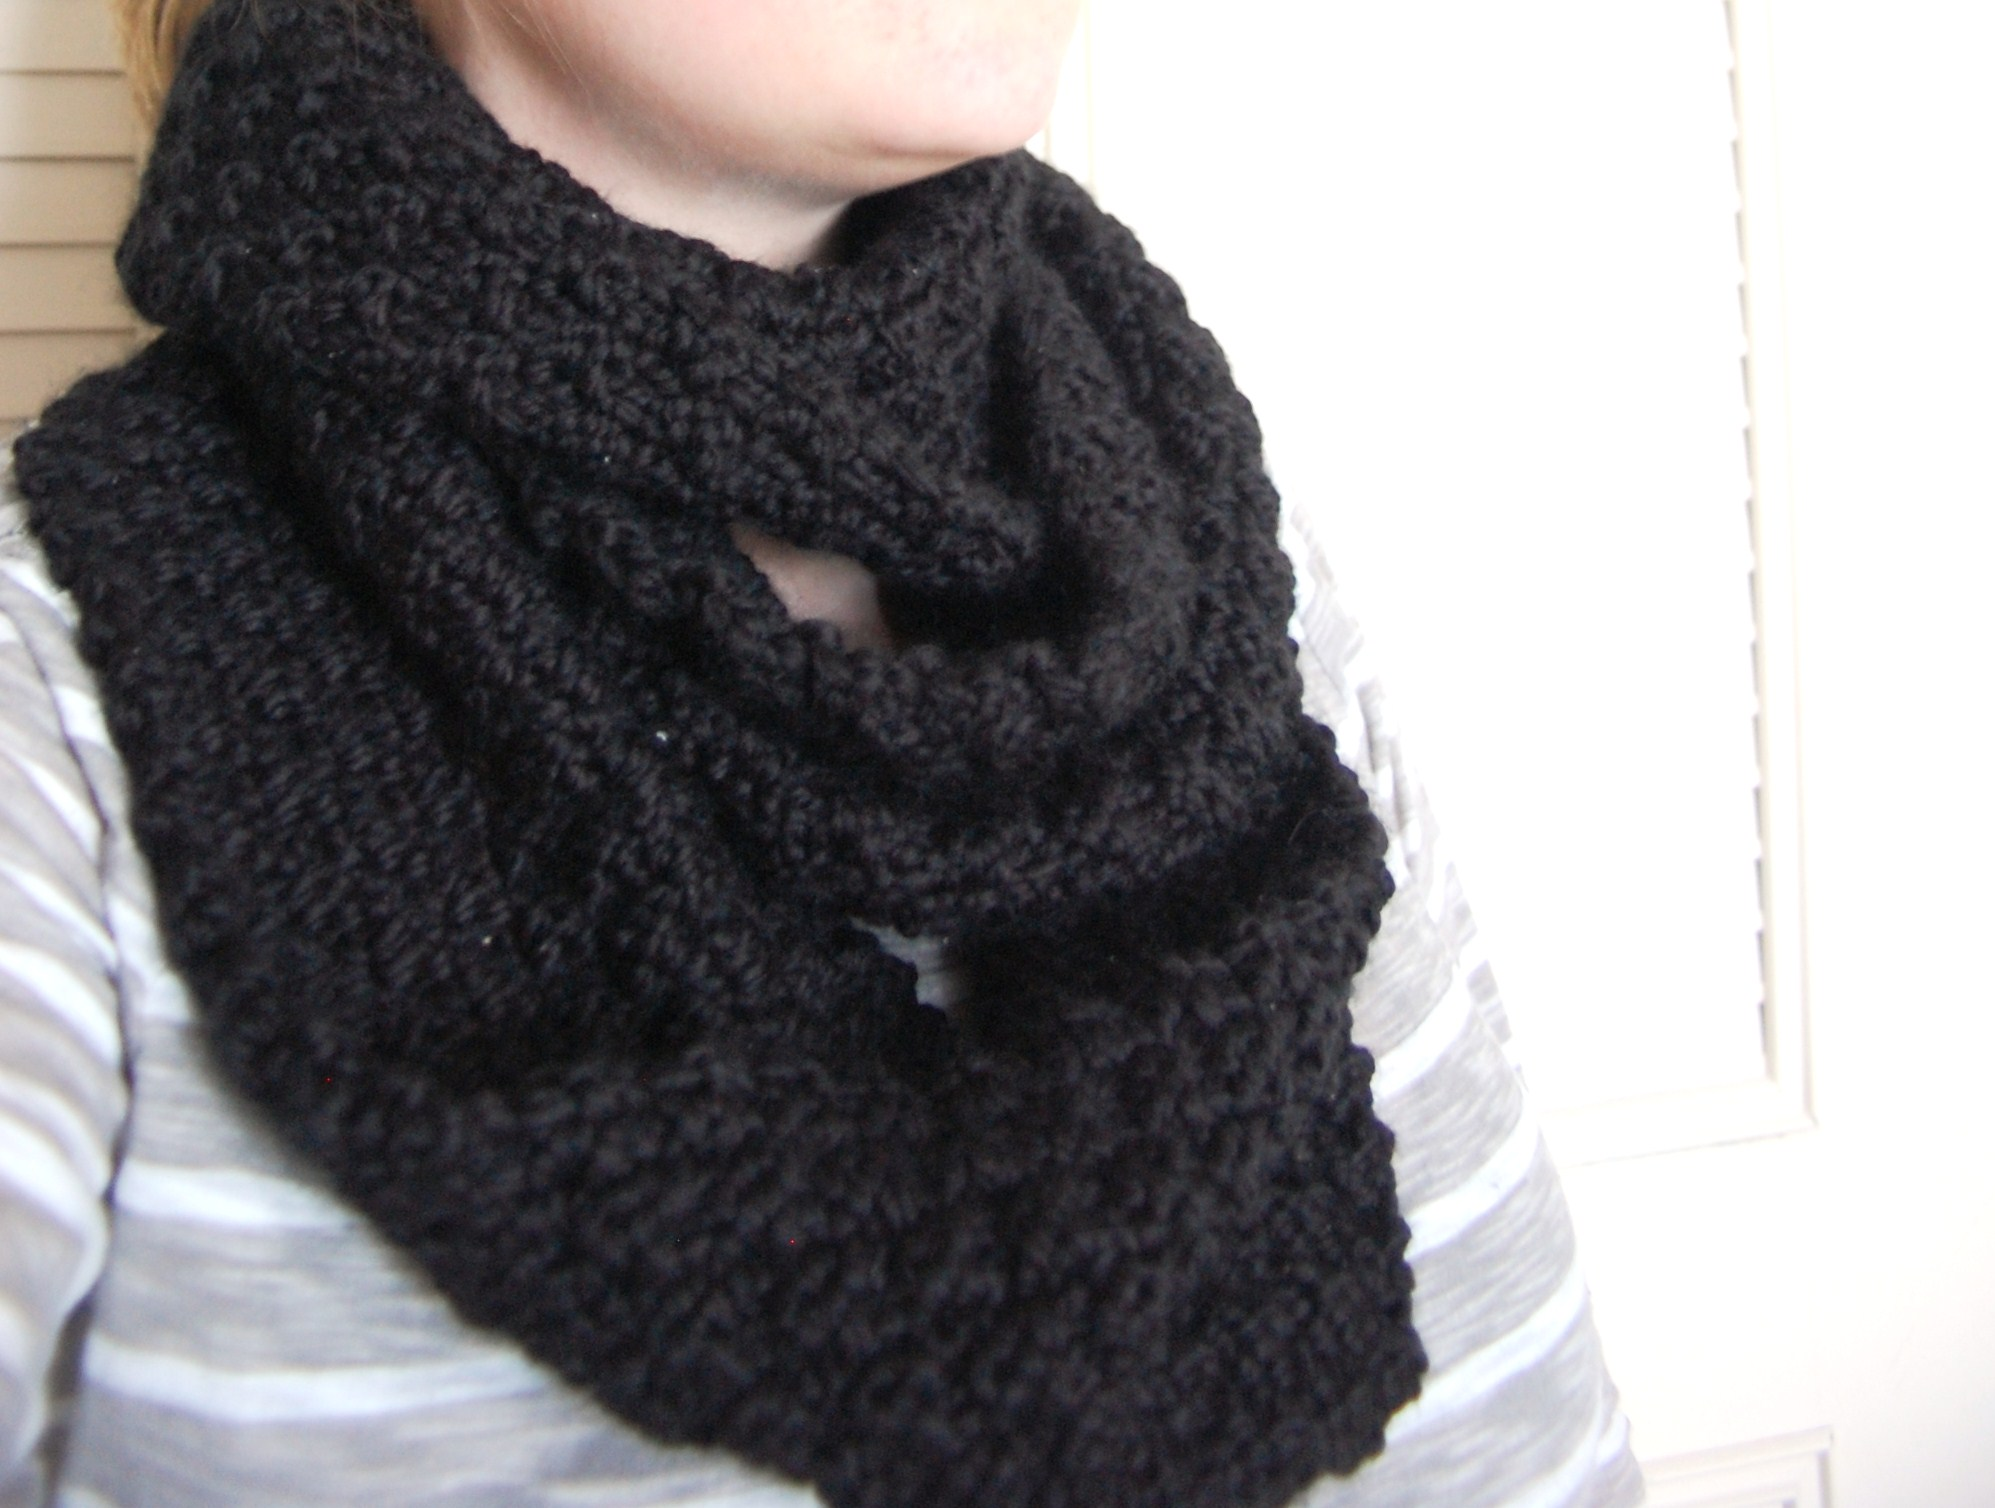 More Knitting Wheel Fashions : January 2012 knittybutton